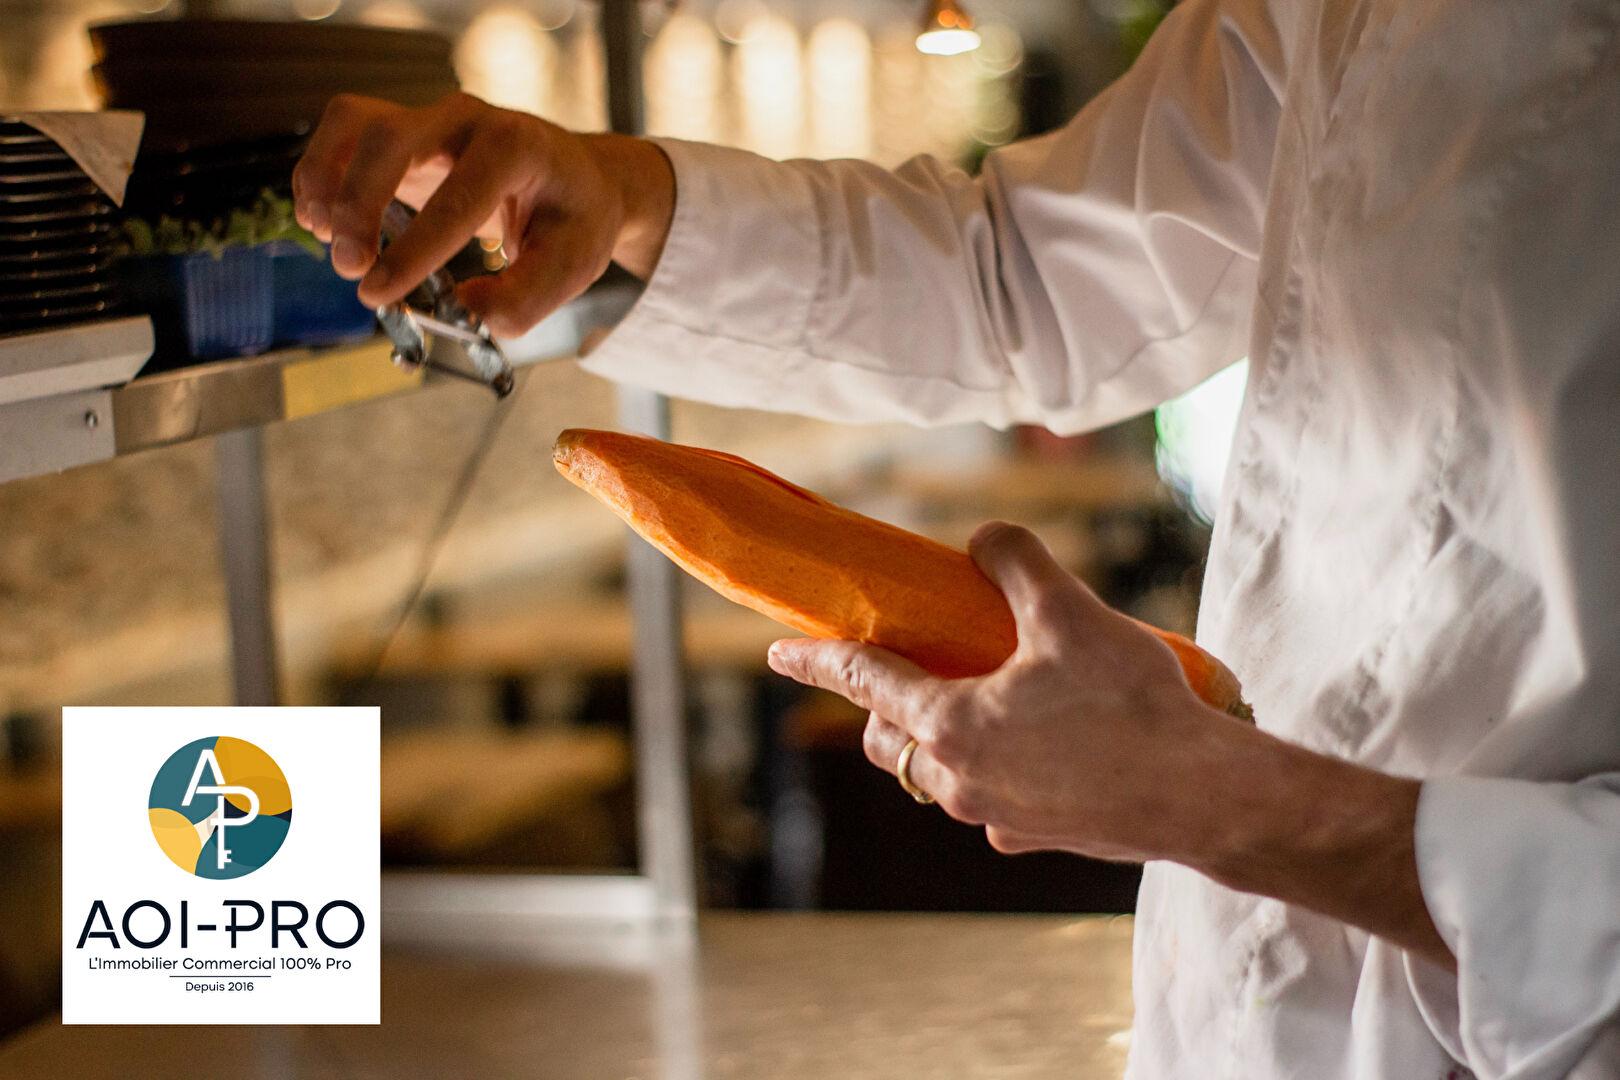 Magasin d'alimentation à louer - 60.0 m2 - 33 - Gironde